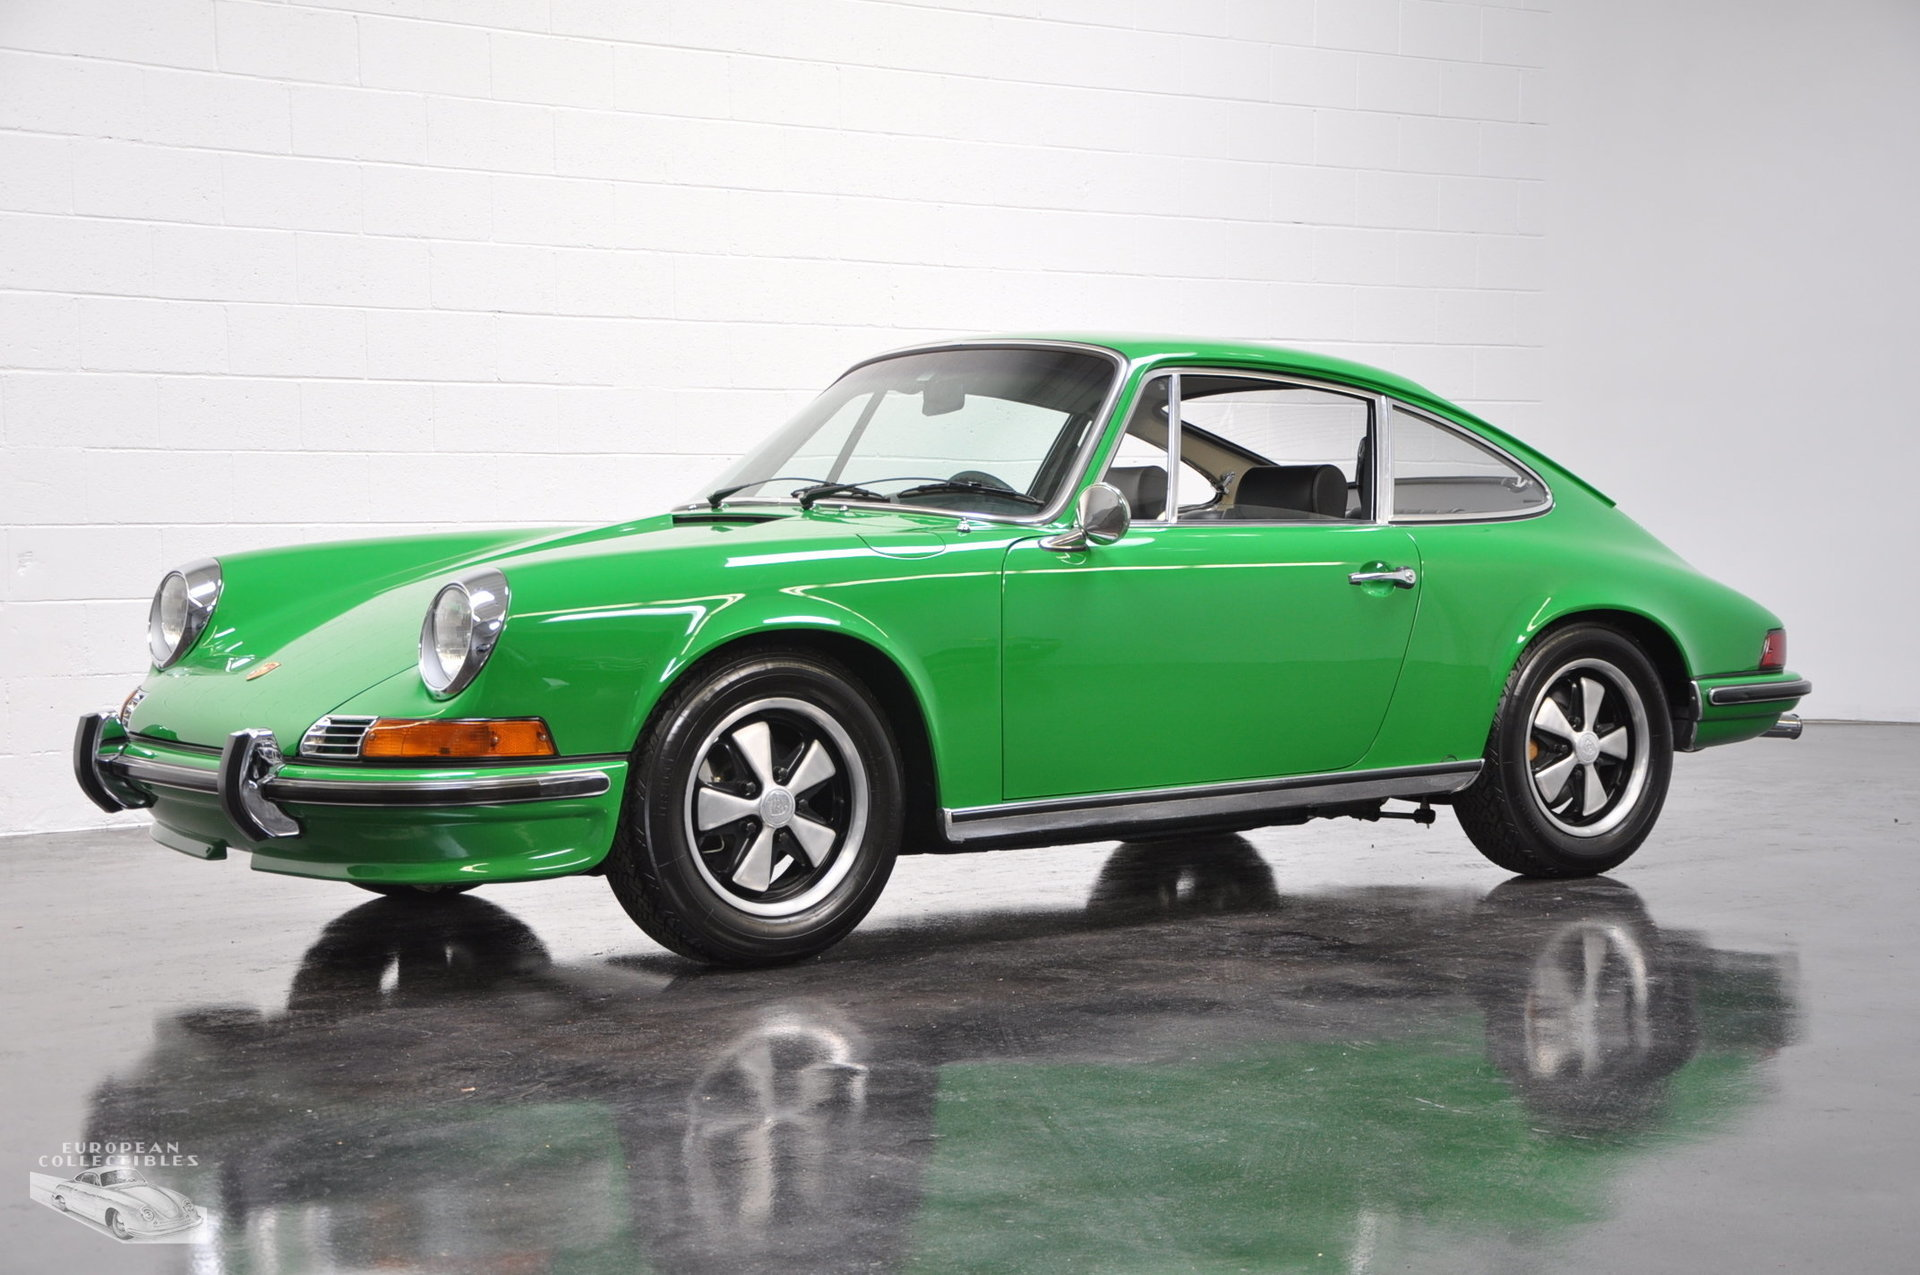 1970 porsche 911s coupe for sale 65581 mcg. Black Bedroom Furniture Sets. Home Design Ideas